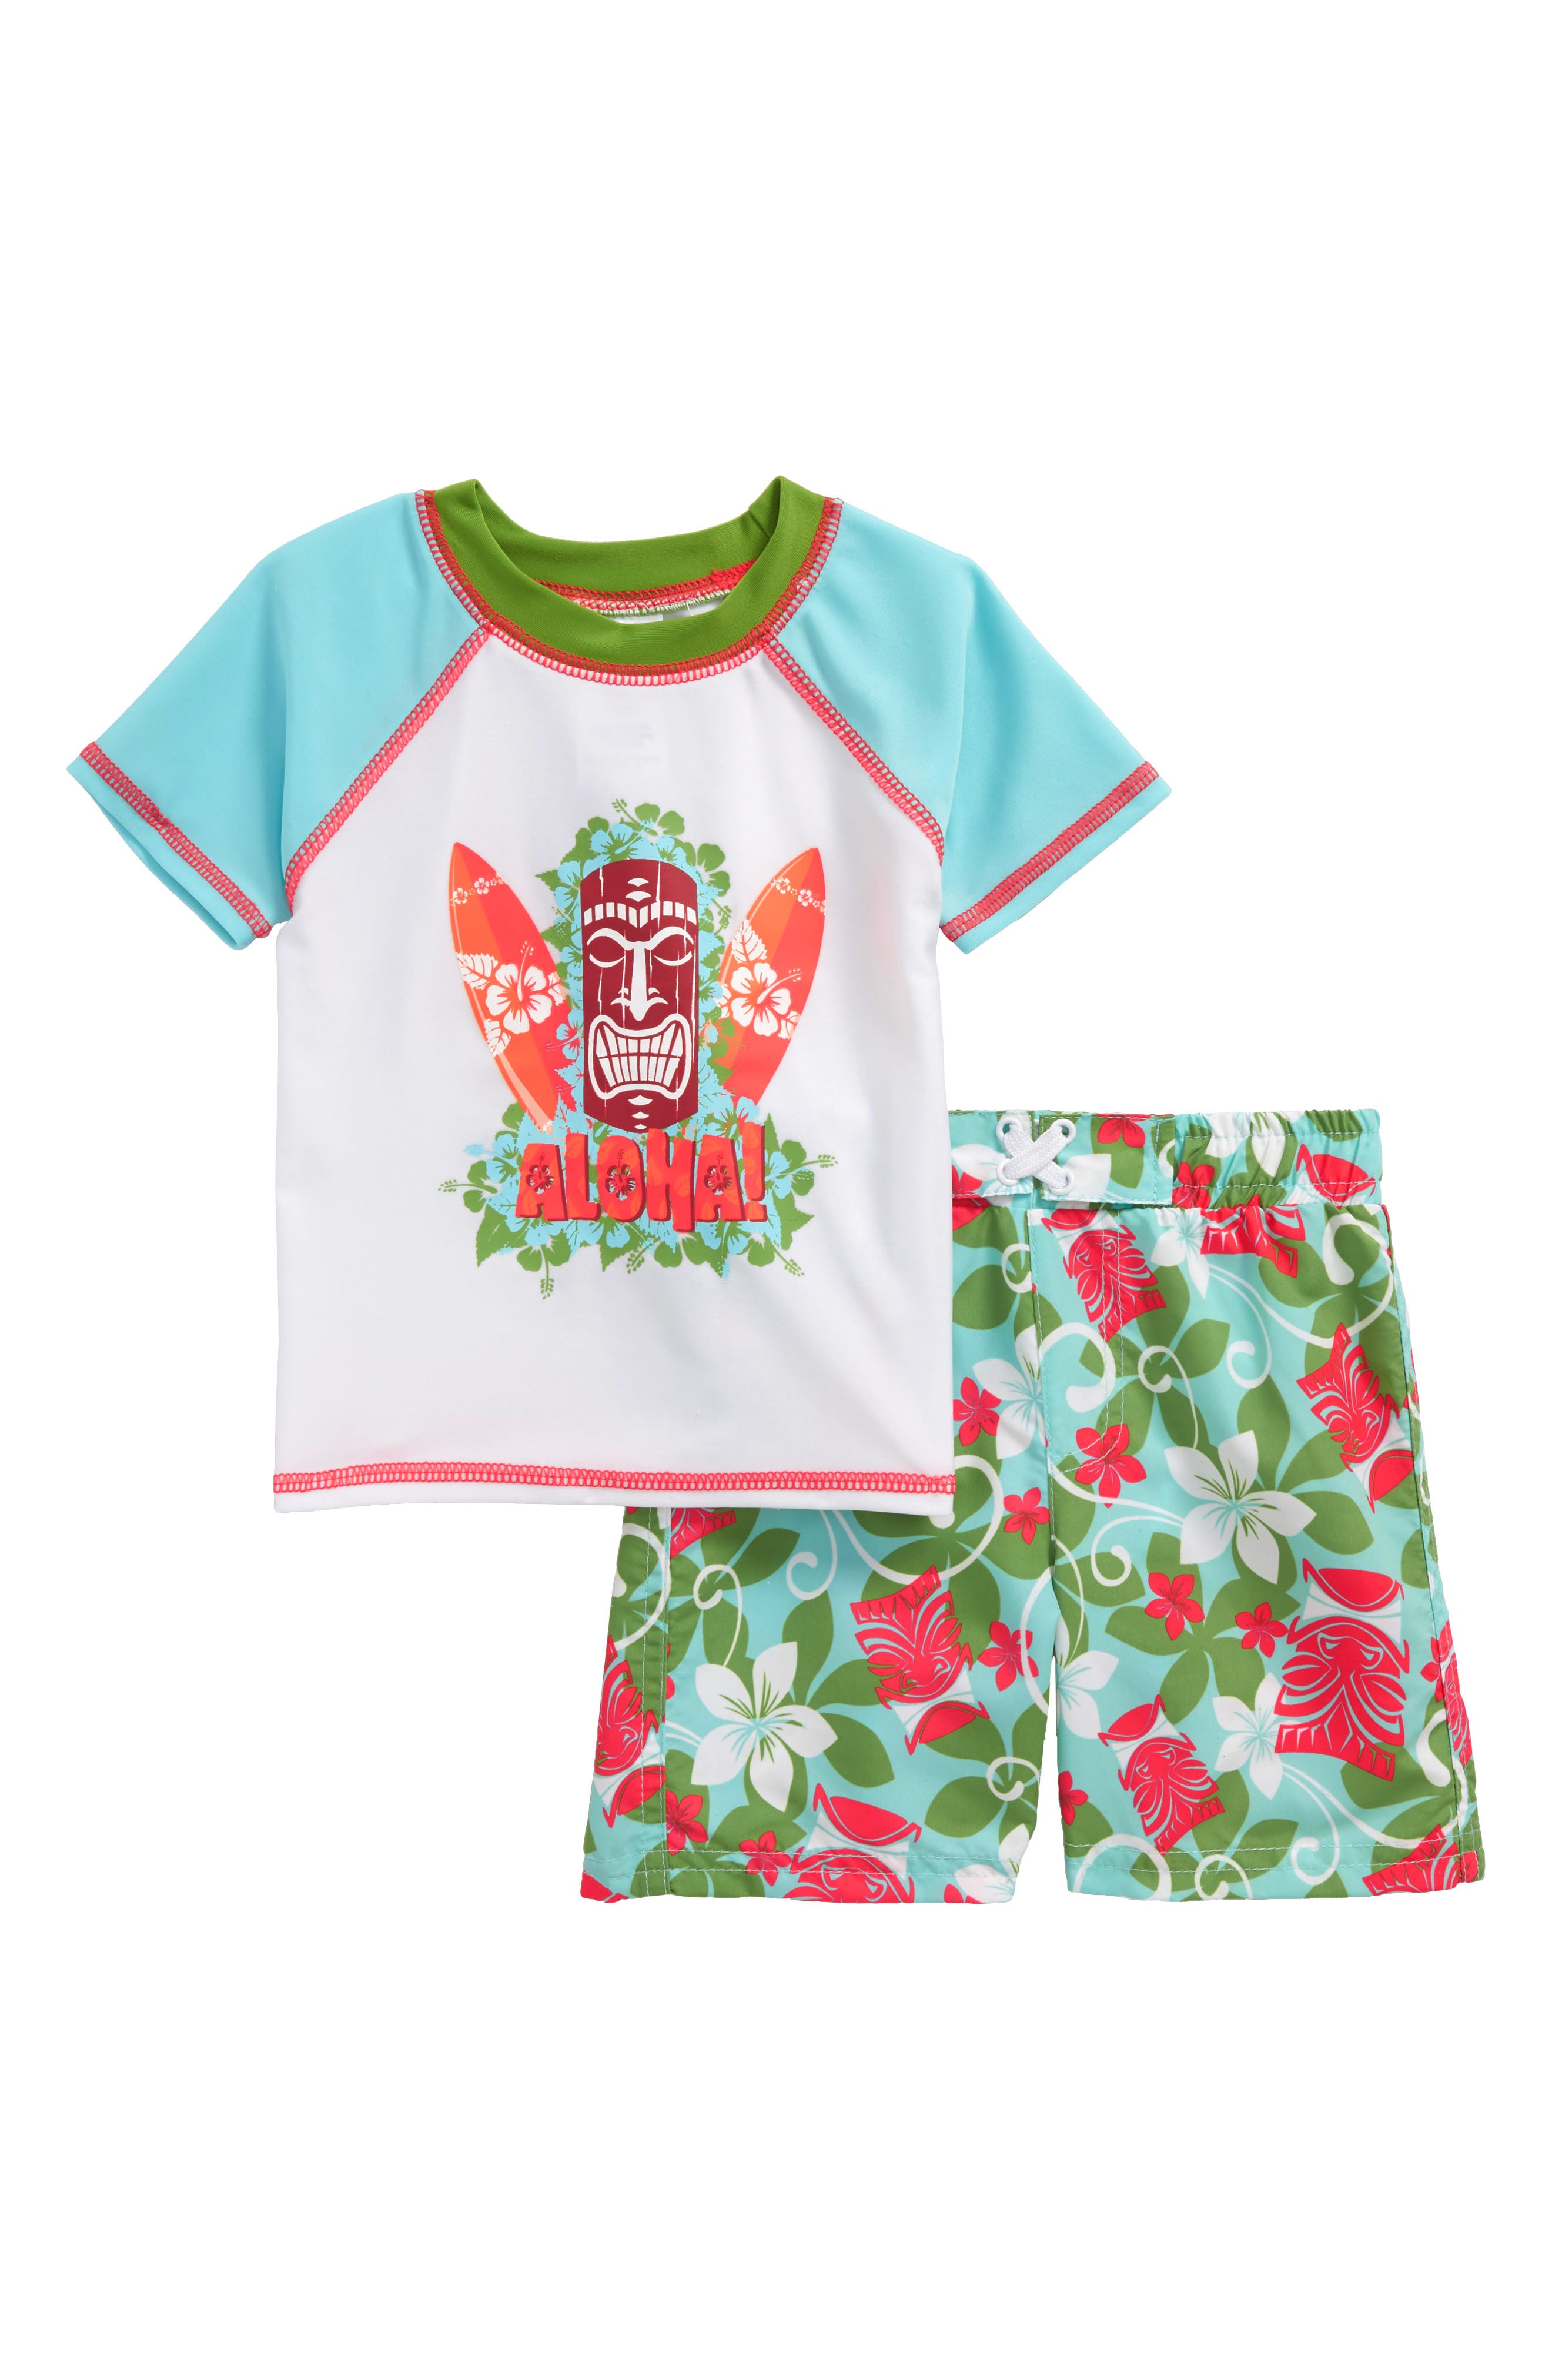 Aloha Tiki Two-Piece Rashguard Swimsuit,                         Main,                         color, 440